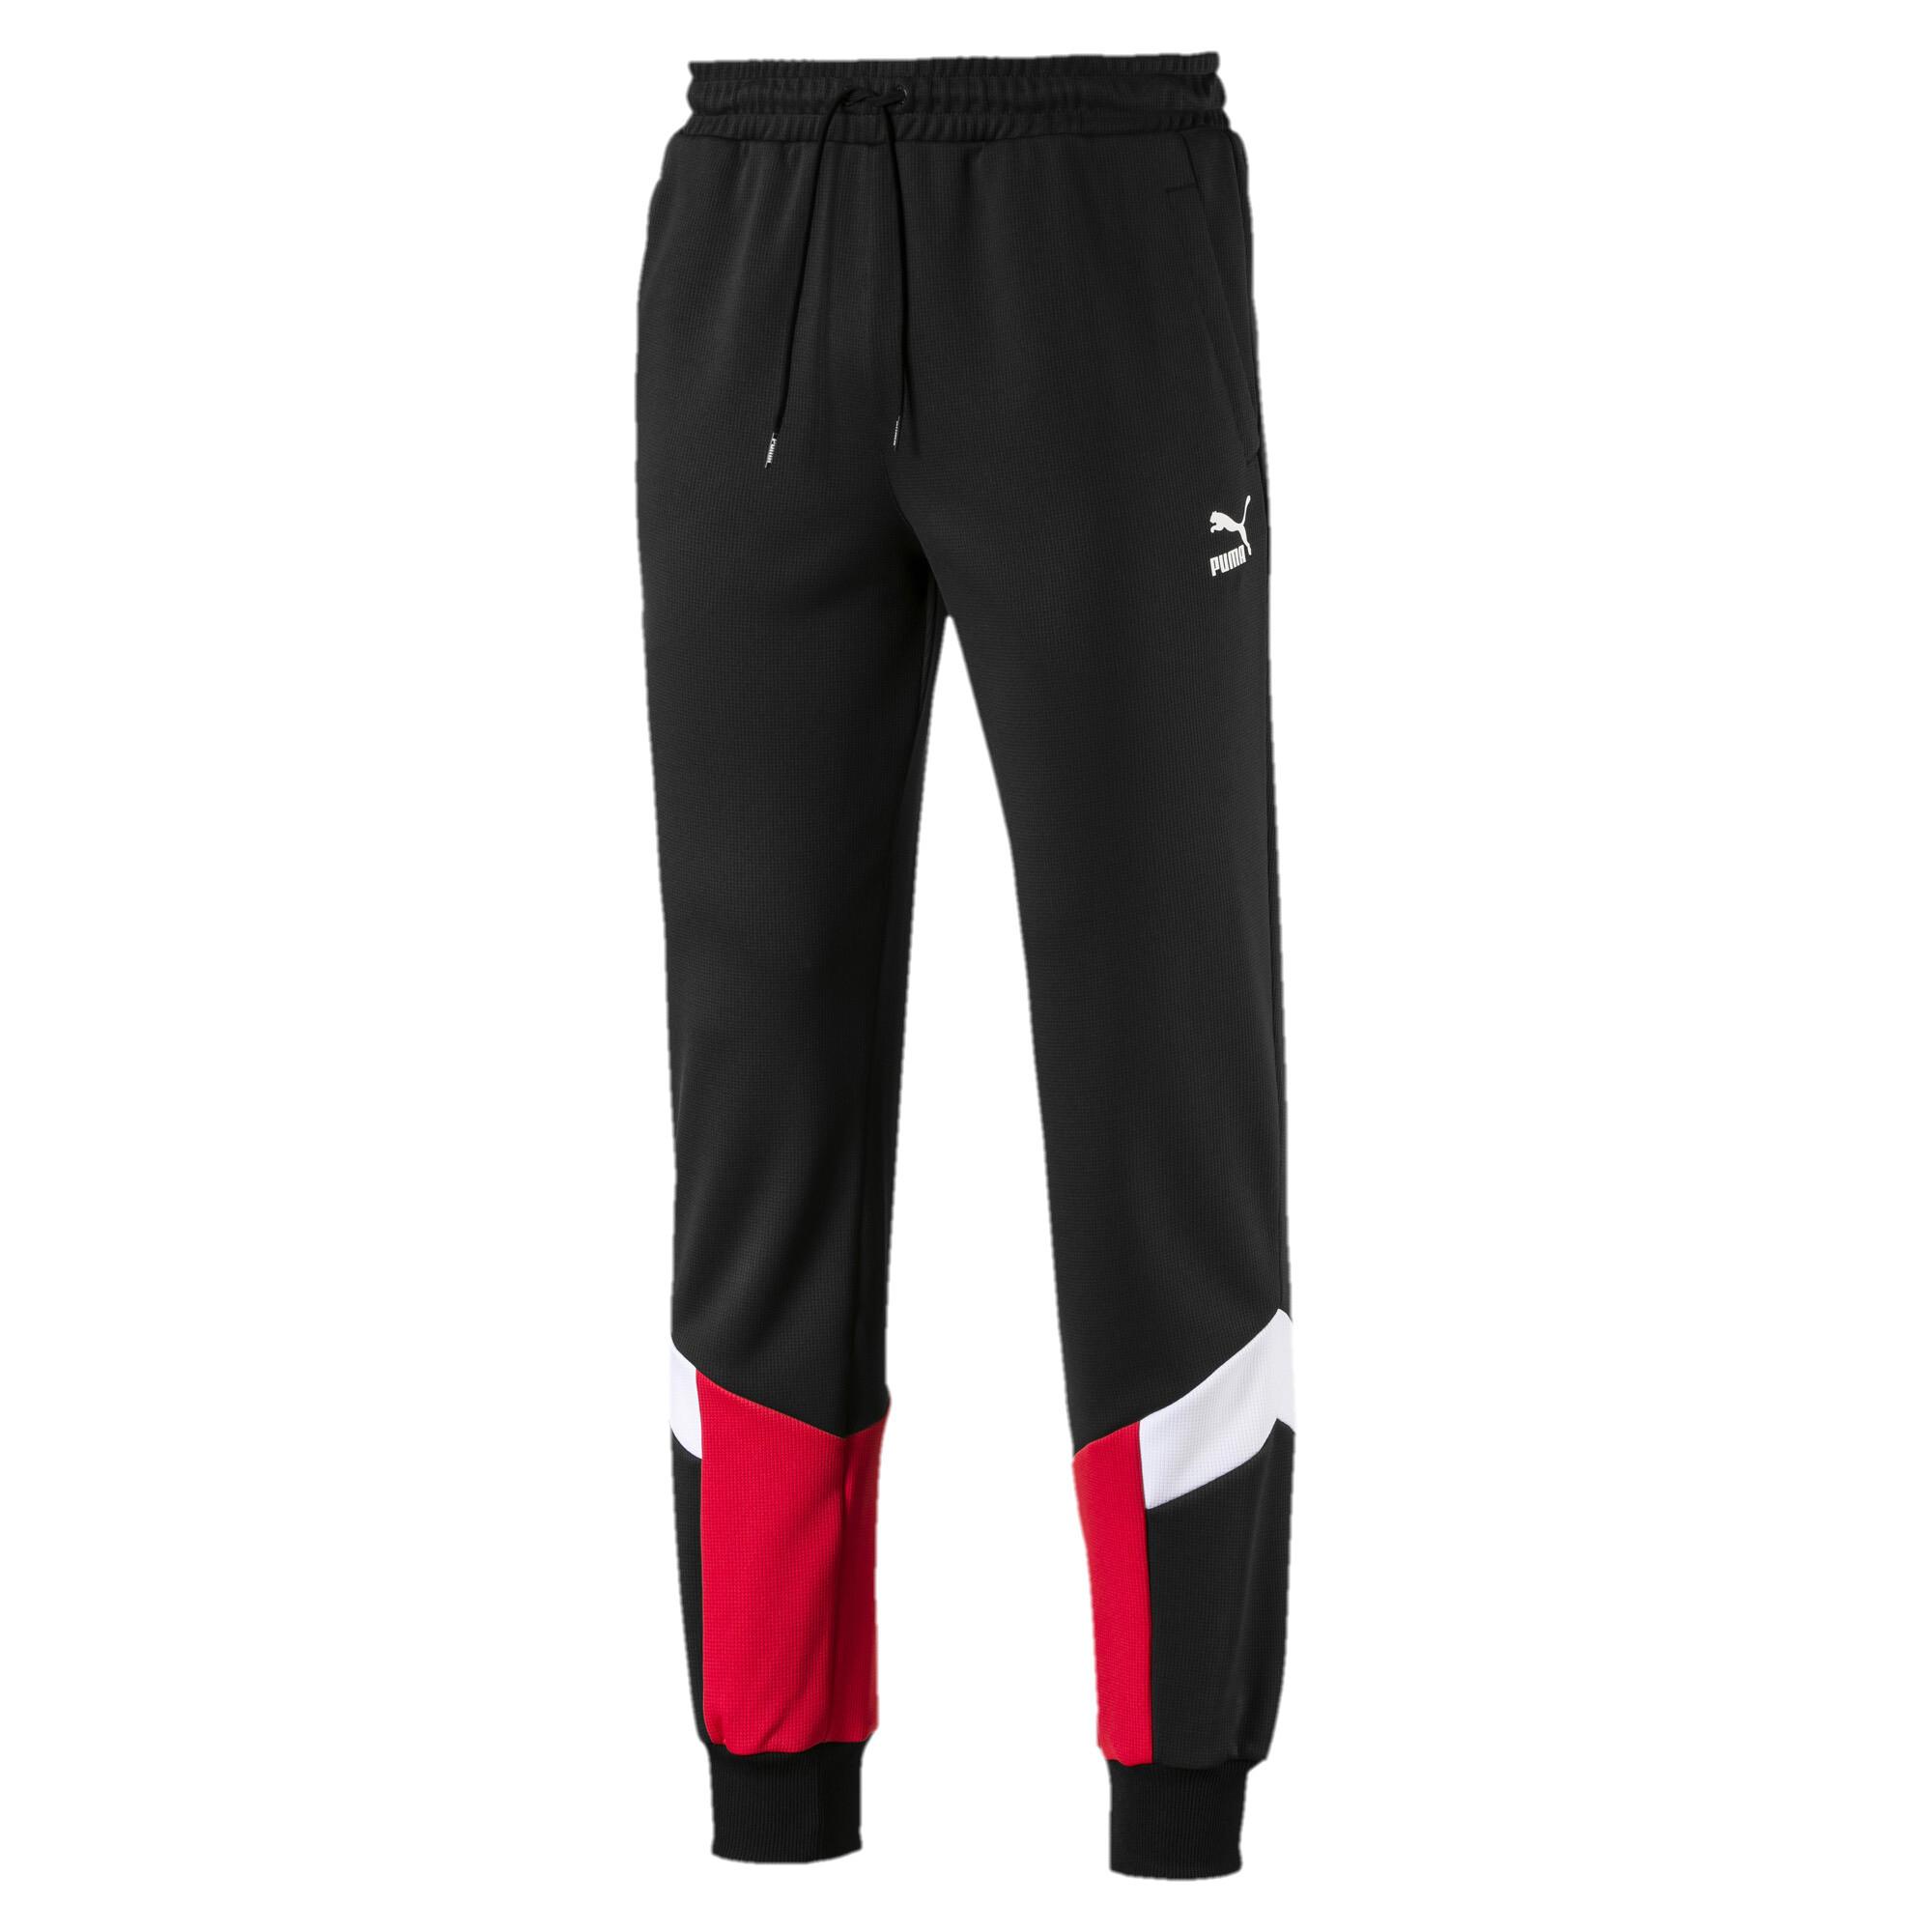 Image Puma Iconic MCS Mesh Knitted Men's Track Pants #4